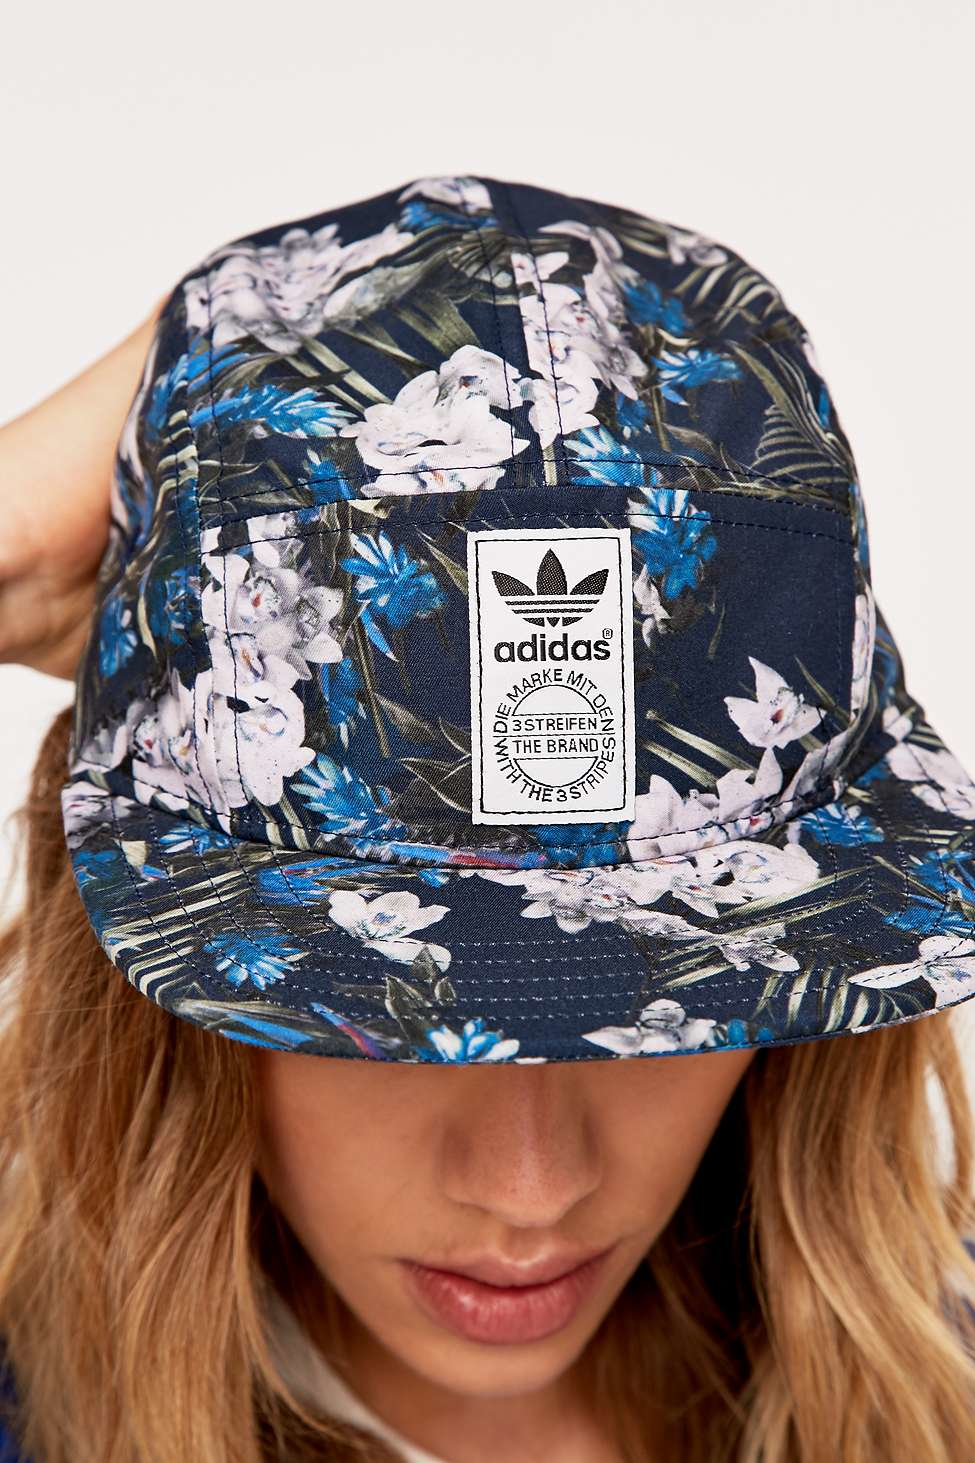 italy adidas hat flower 8b2a1 f61d4 45234350e1a9